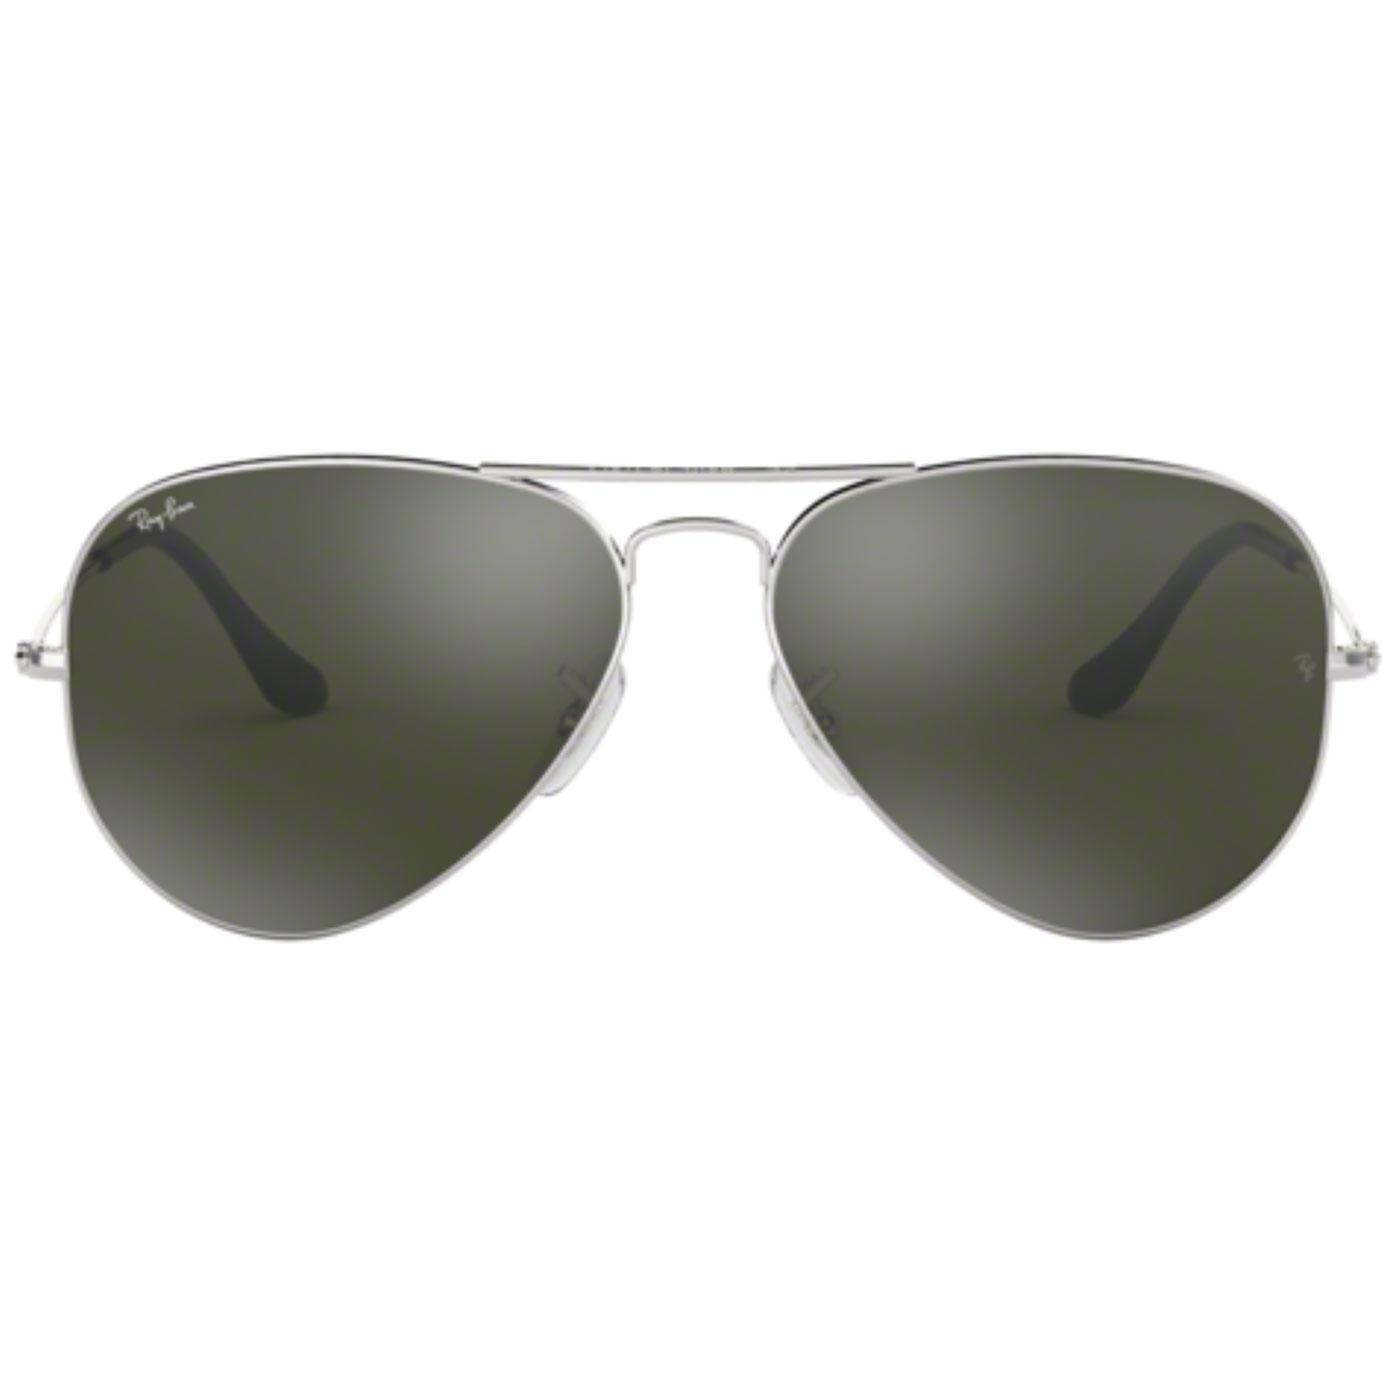 Ray-Ban Retro 60s Mod Aviator Indie Sunglasses SM